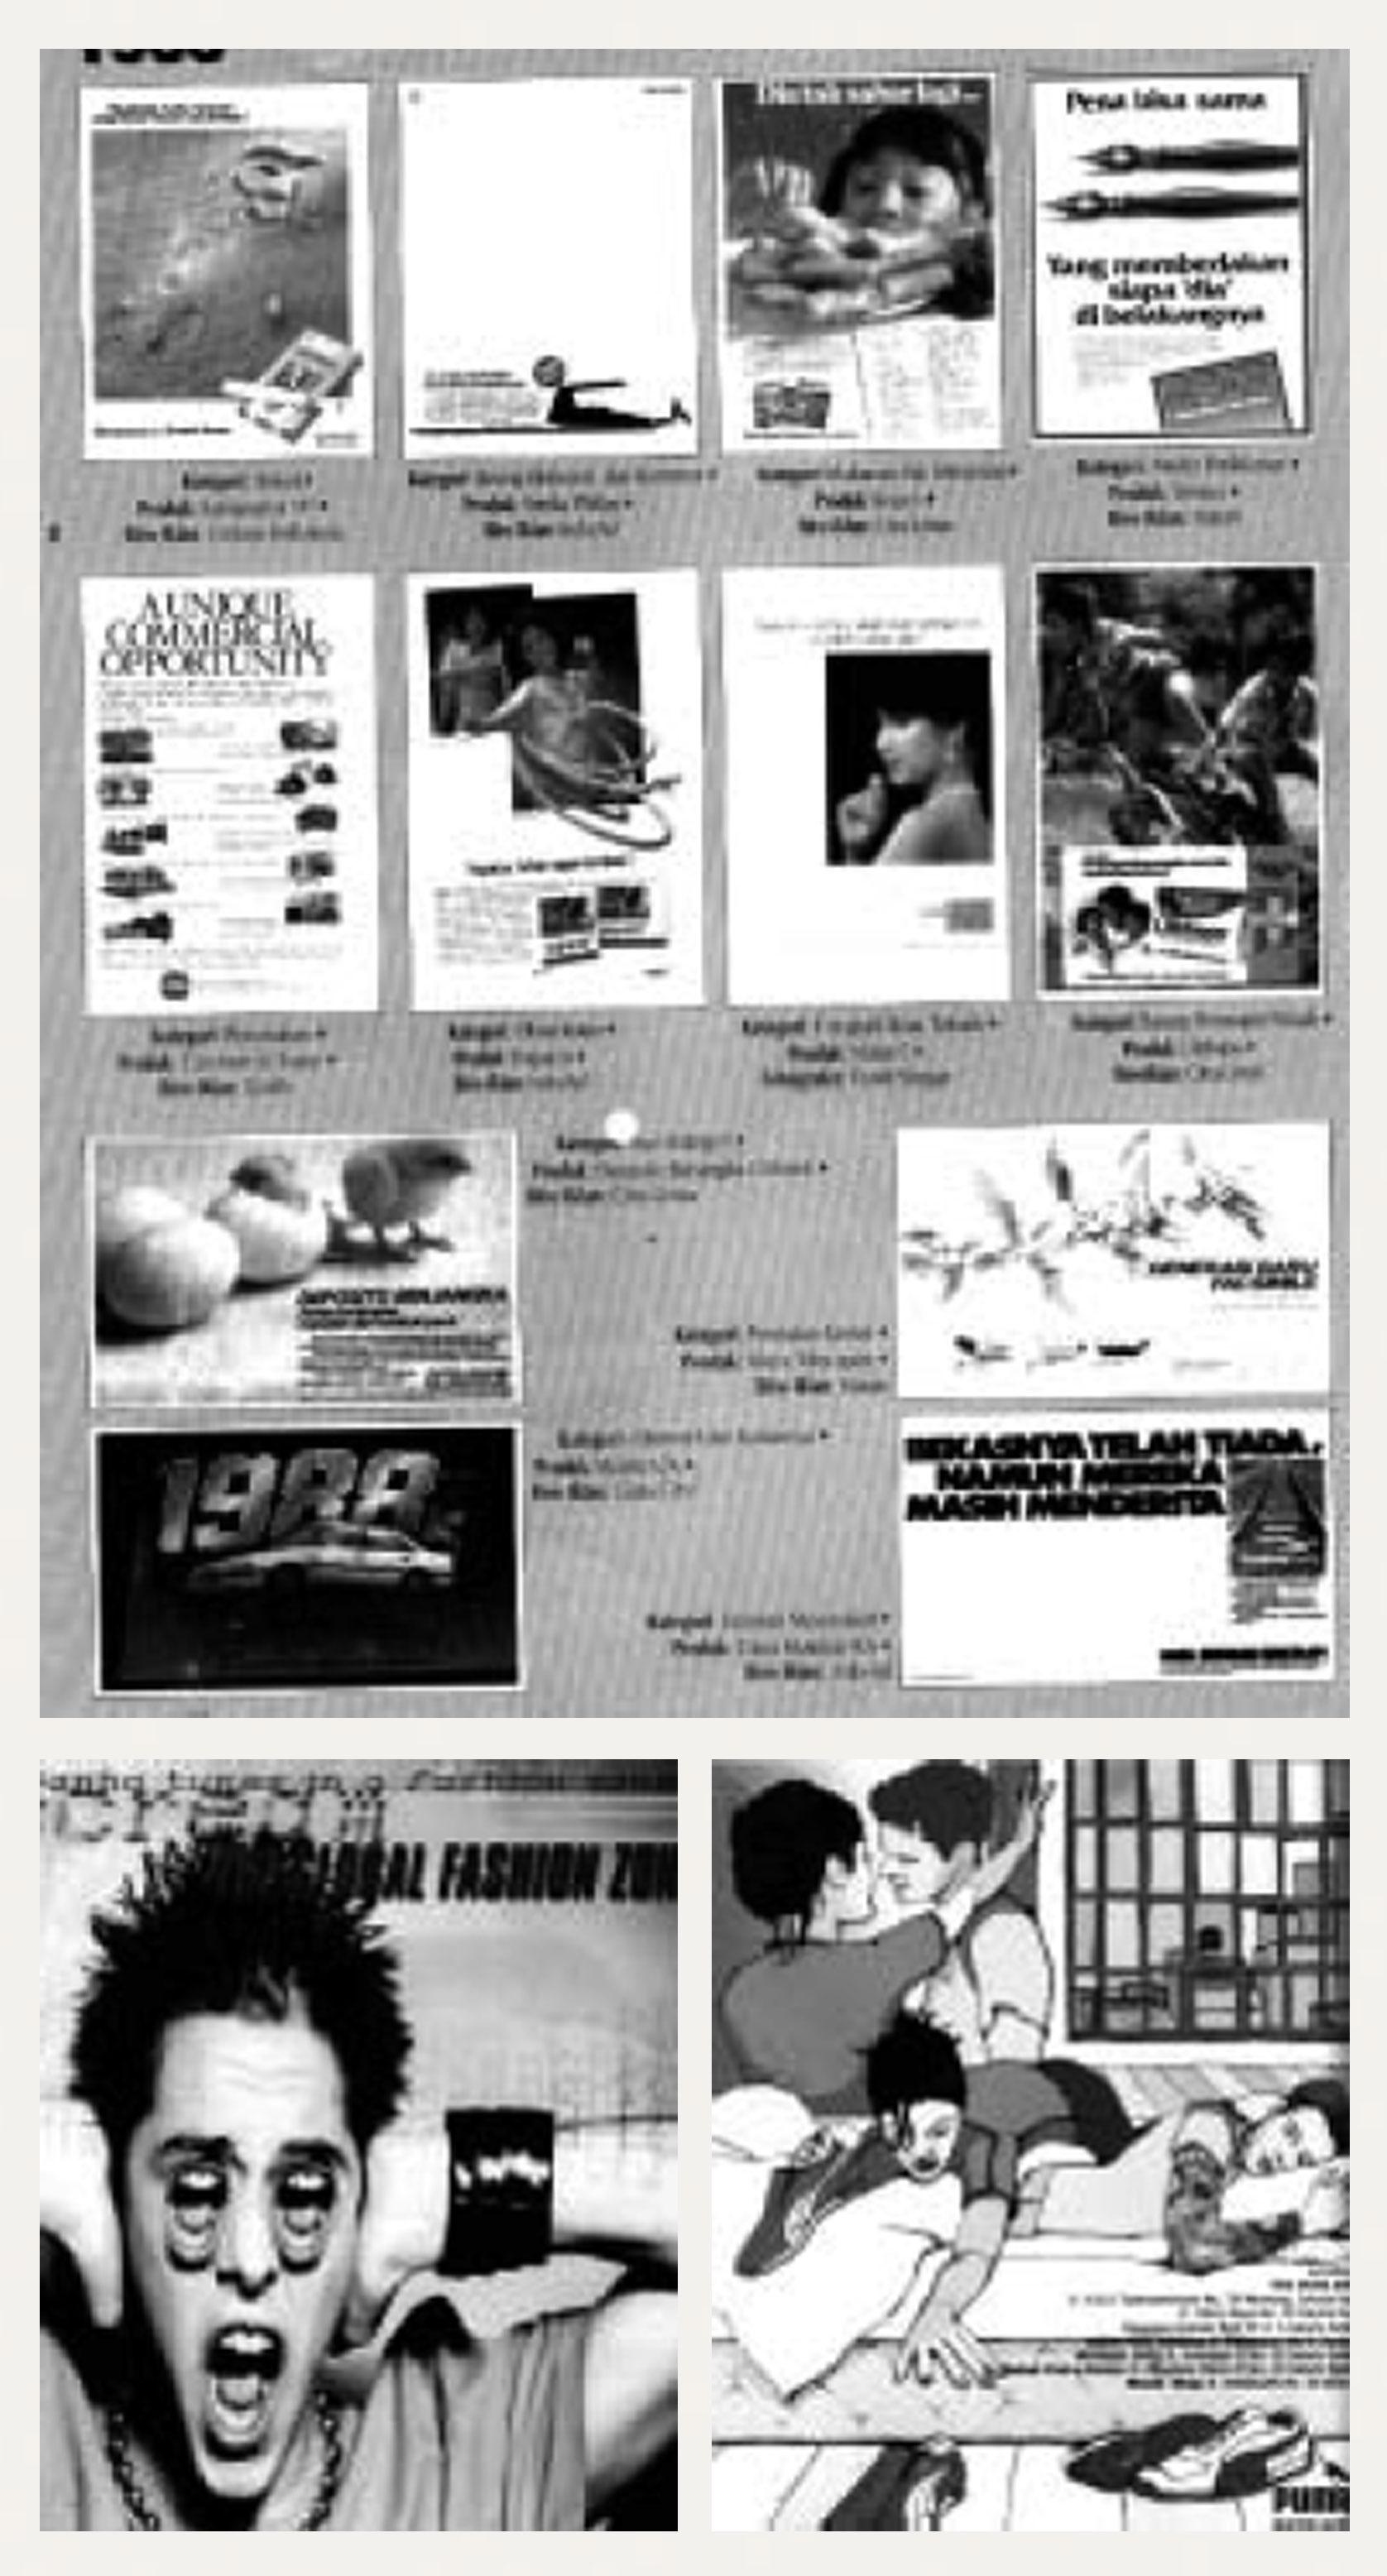 Gambar 5. (a) Sejumlah karya iklan di tahun 1980-an sebagai nominator pemenang penghargaan iklan terbaik Citra Pariwara dengan sejumlah gaya visual Pop-Modern; (b & c) dua buah iklan dalam majalah Trolley yang terbit akhir dekade 1990-an dengan gaya visual Posmodern.(Sumber: Ditjen Pembinaan Pers dan Grafika,1998)